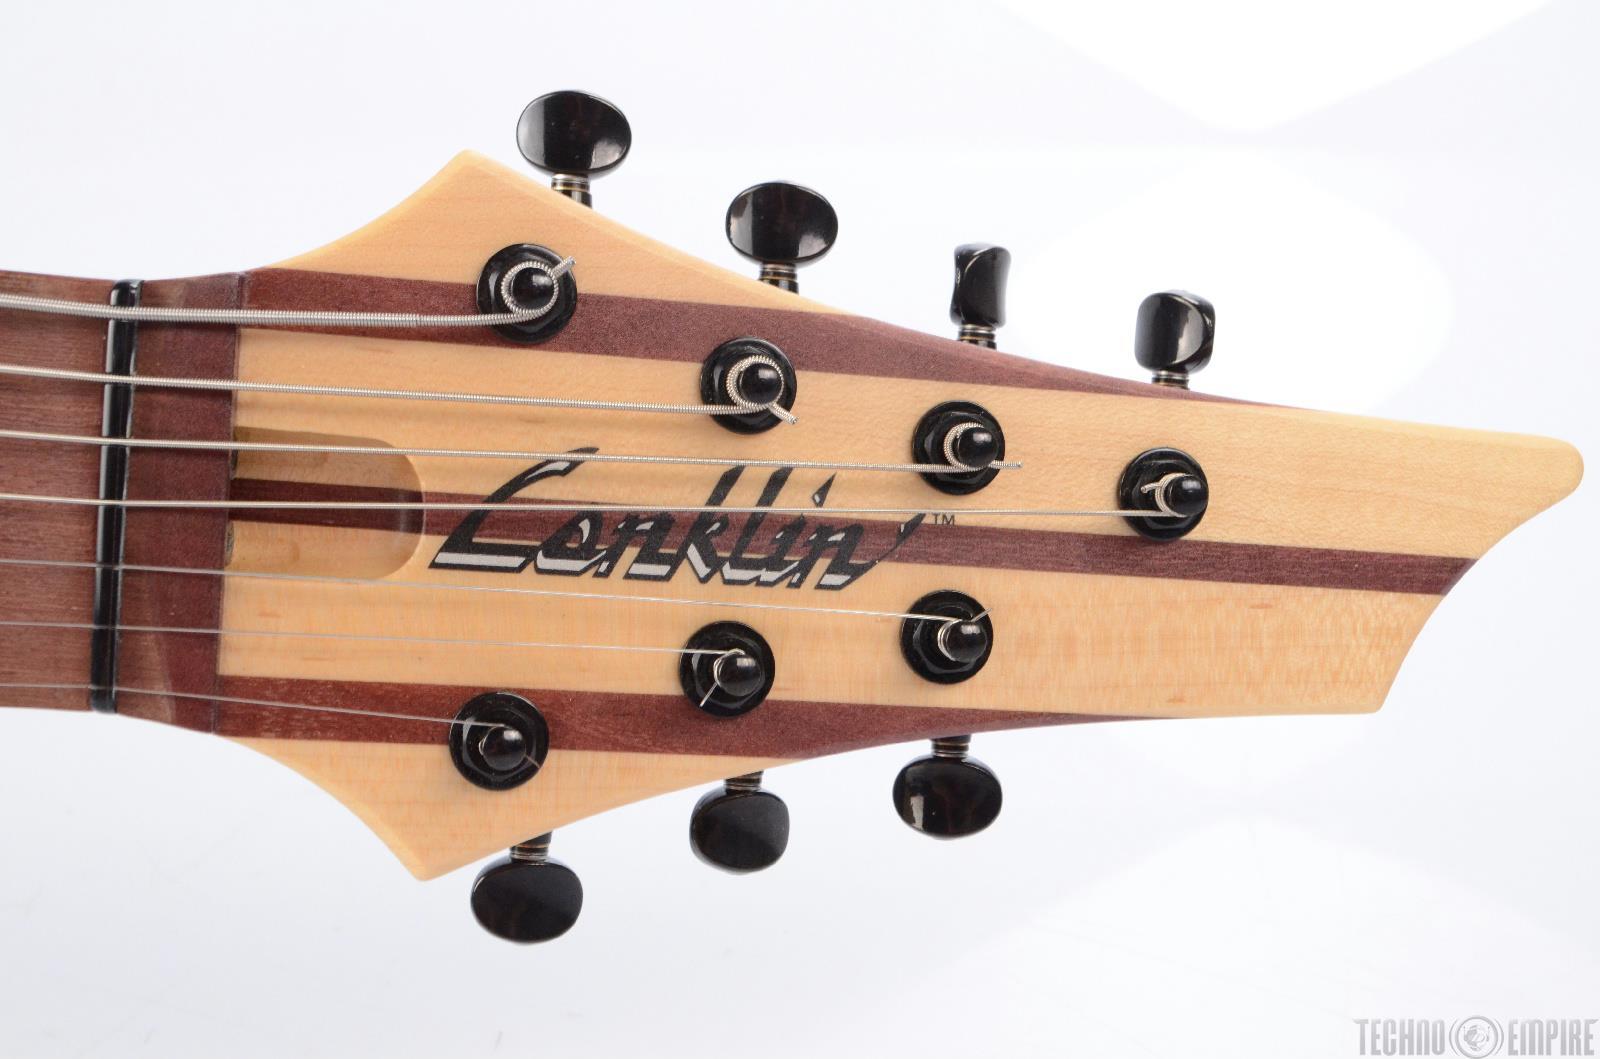 conklin sidewinder 7 string scalloped electric guitar bass tar 16479 ebay. Black Bedroom Furniture Sets. Home Design Ideas